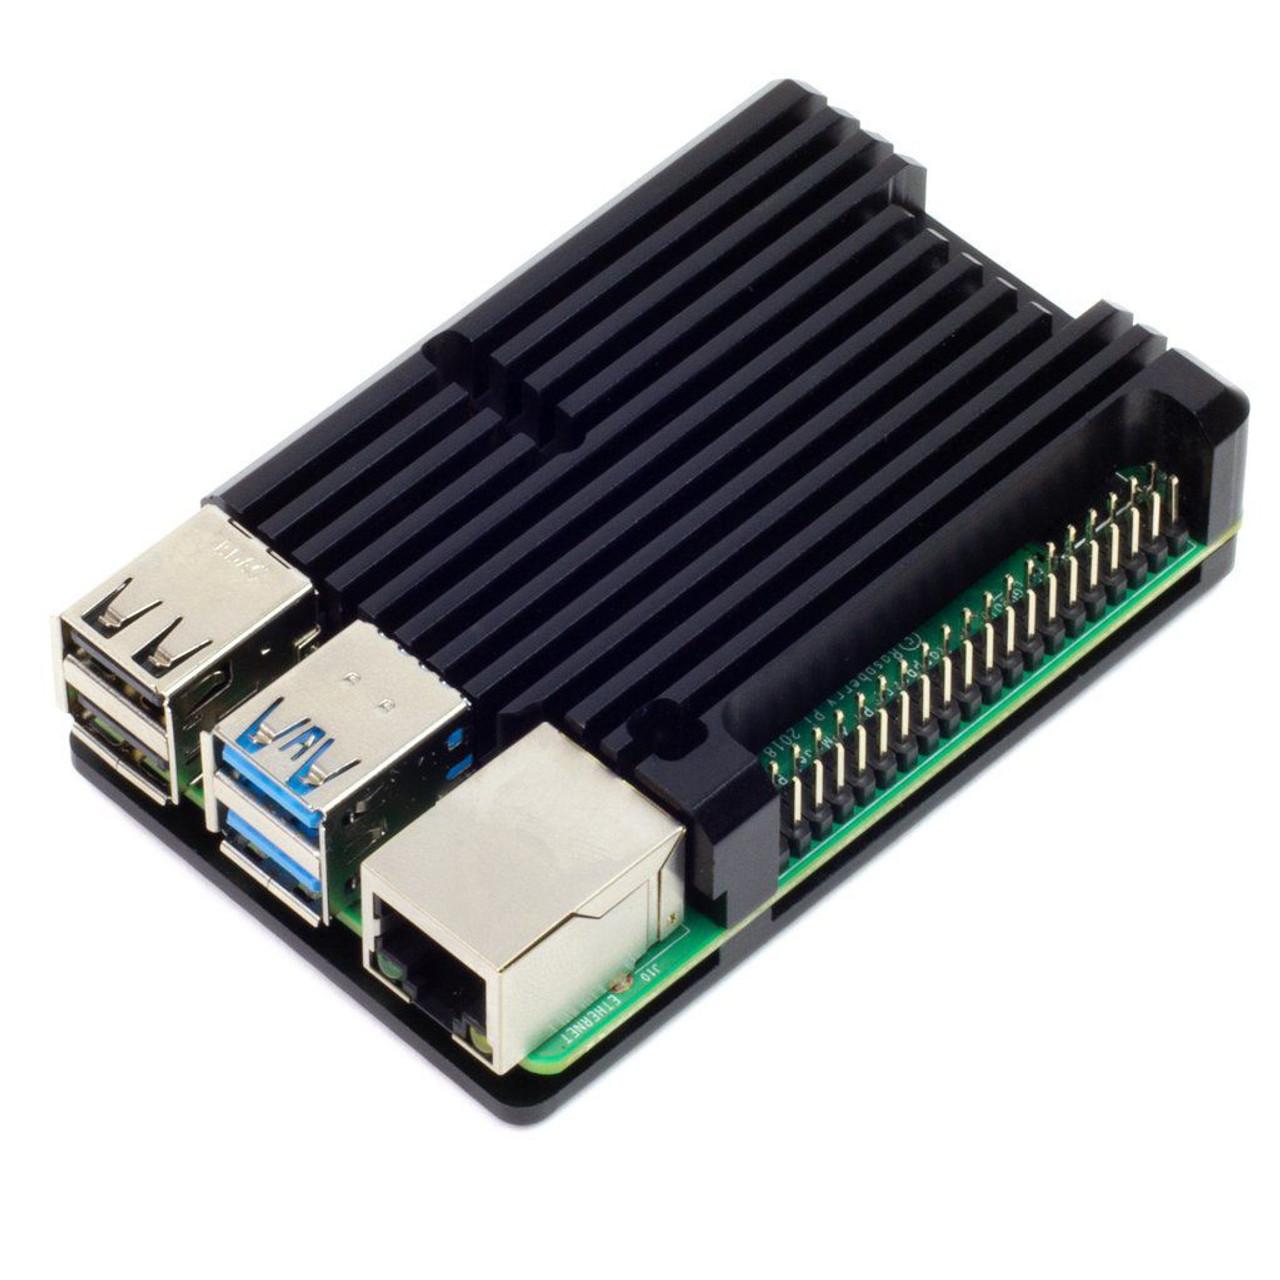 Case Black iphoenix Raspberry Pi 4 B Model B